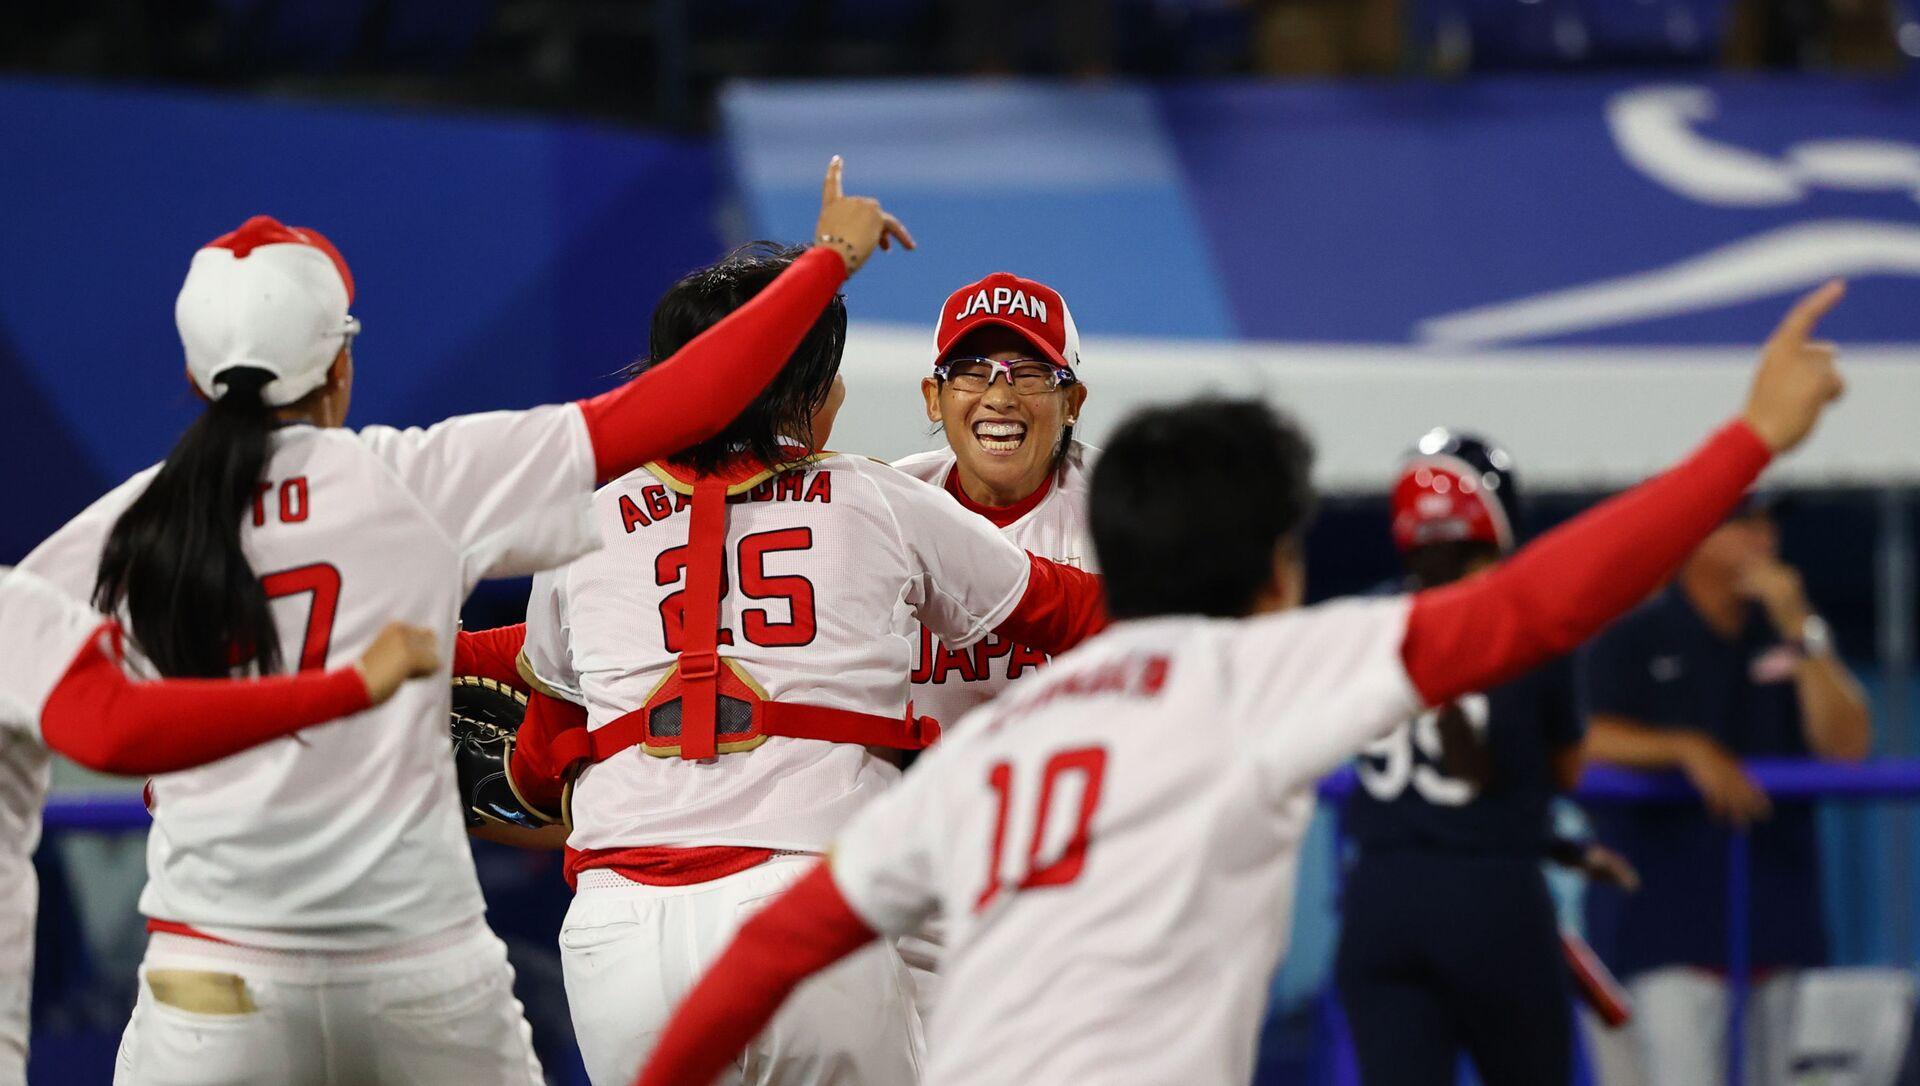 Yukiko Ueno of Japan and team mates celebrate winning the game. Tokyo 2020 Olympics - Softball - Women - Finals - Japan v United States. 27 July 2021 - Sputnik International, 1920, 27.07.2021